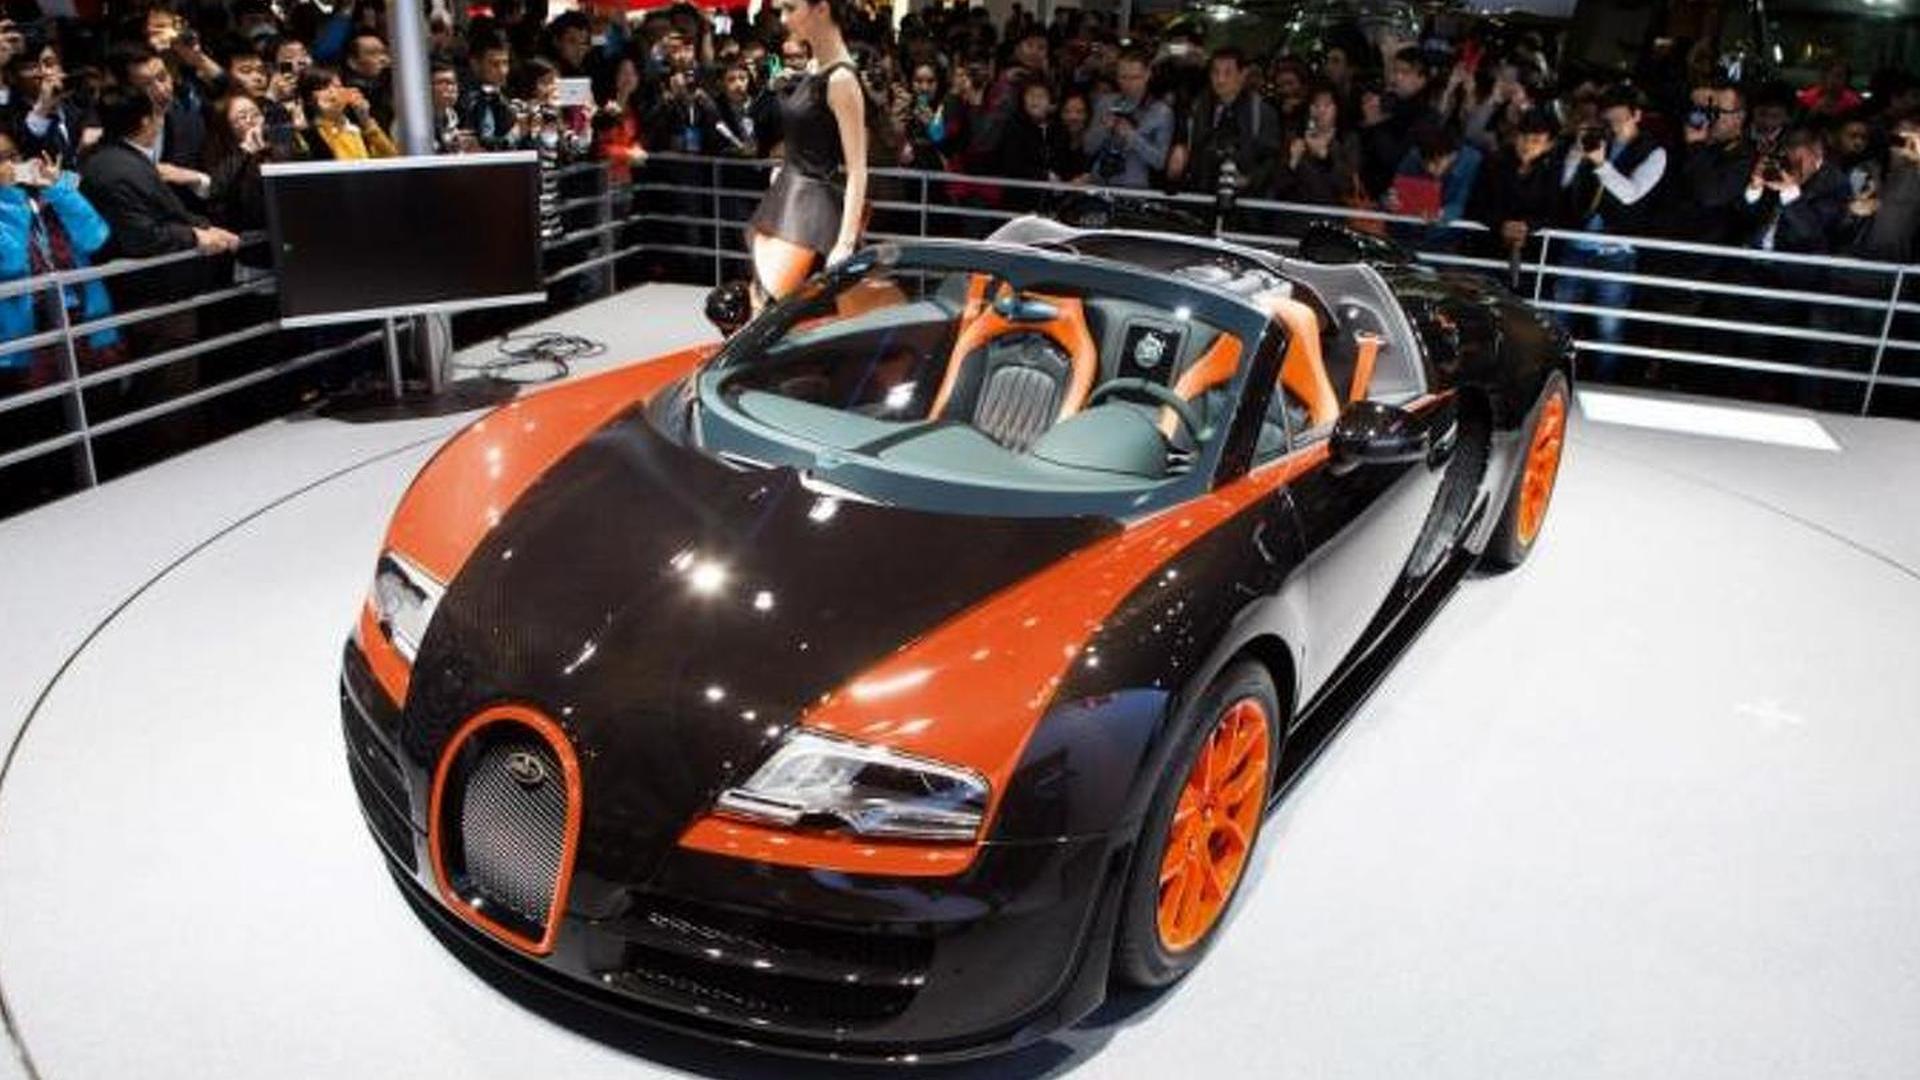 2013-380176-bugatti-veyron-grand-sport-vitesse-world-record-car-edition-at-2013-auto-shang1 Inspiring Bugatti Veyron Grand Sport Vitesse Wrc Cars Trend